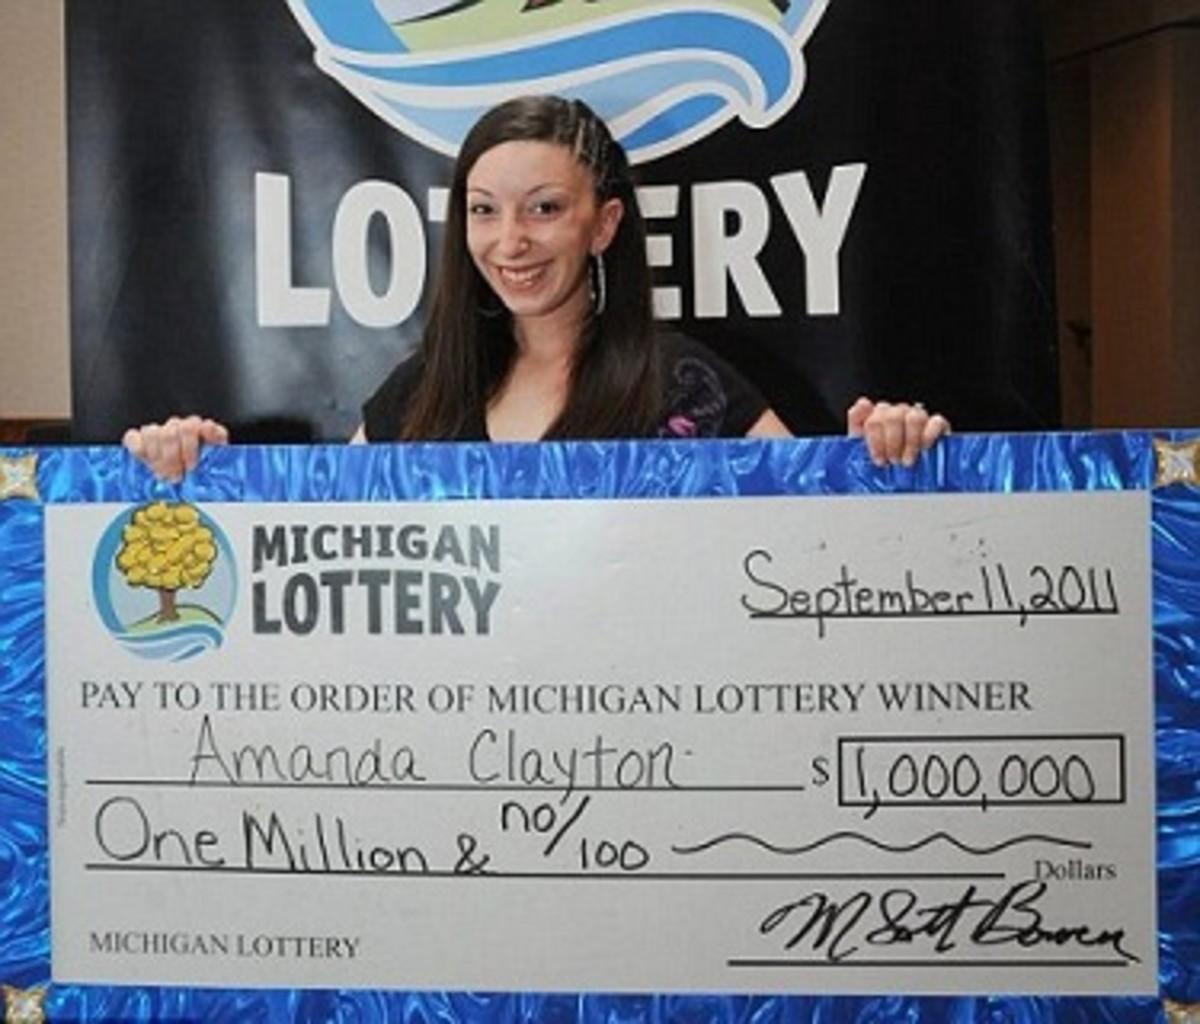 Welfare Recipient and $1 million lottery winner Amanda Clayton.